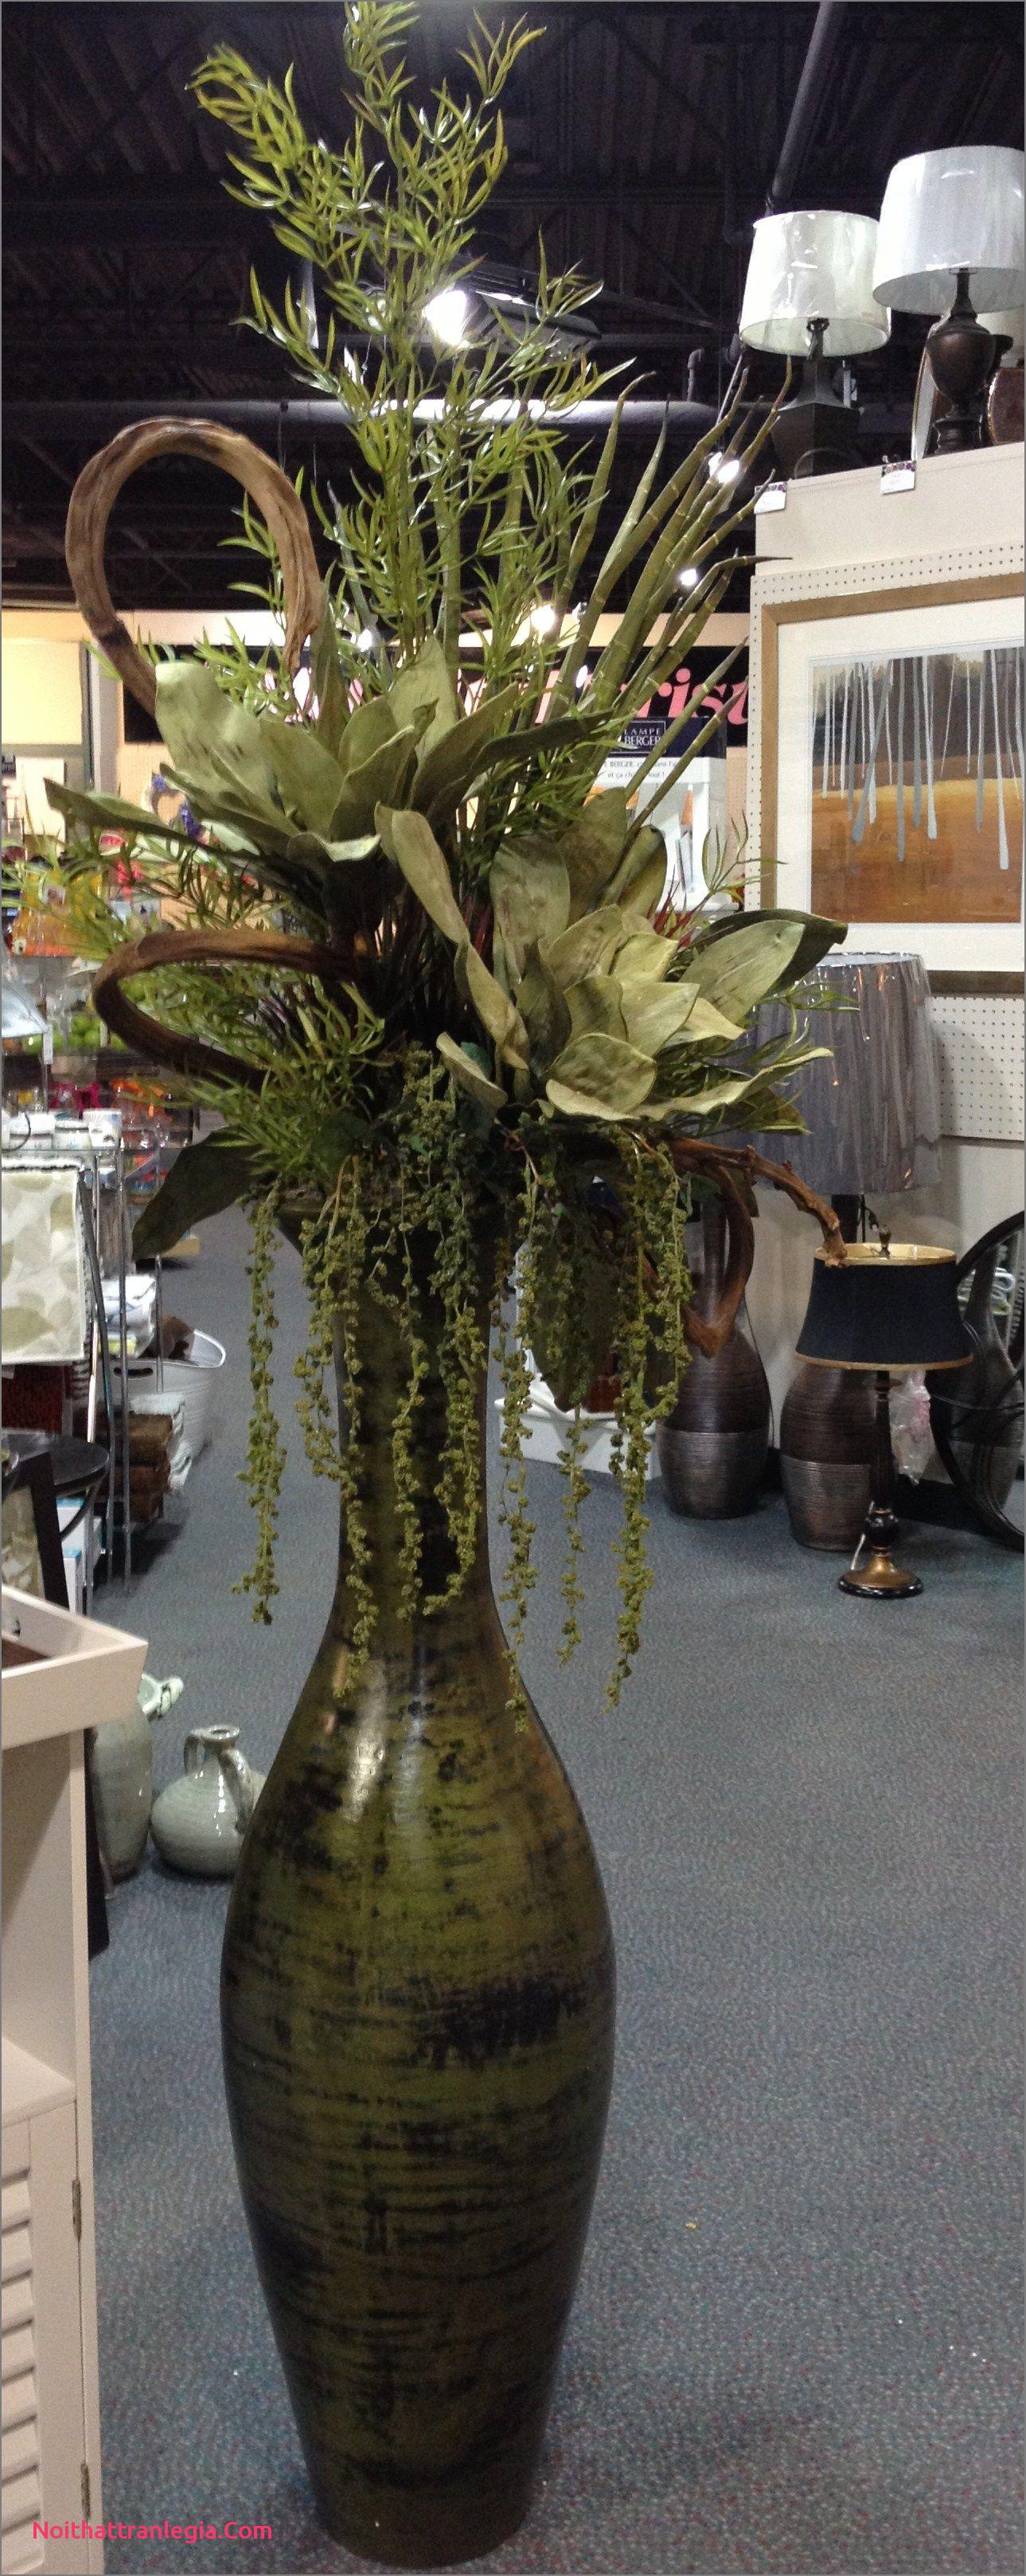 how to make a large floor vase of 20 large floor vase nz noithattranlegia vases design with regard to large floor vase arrangement designed by sandra macpherson